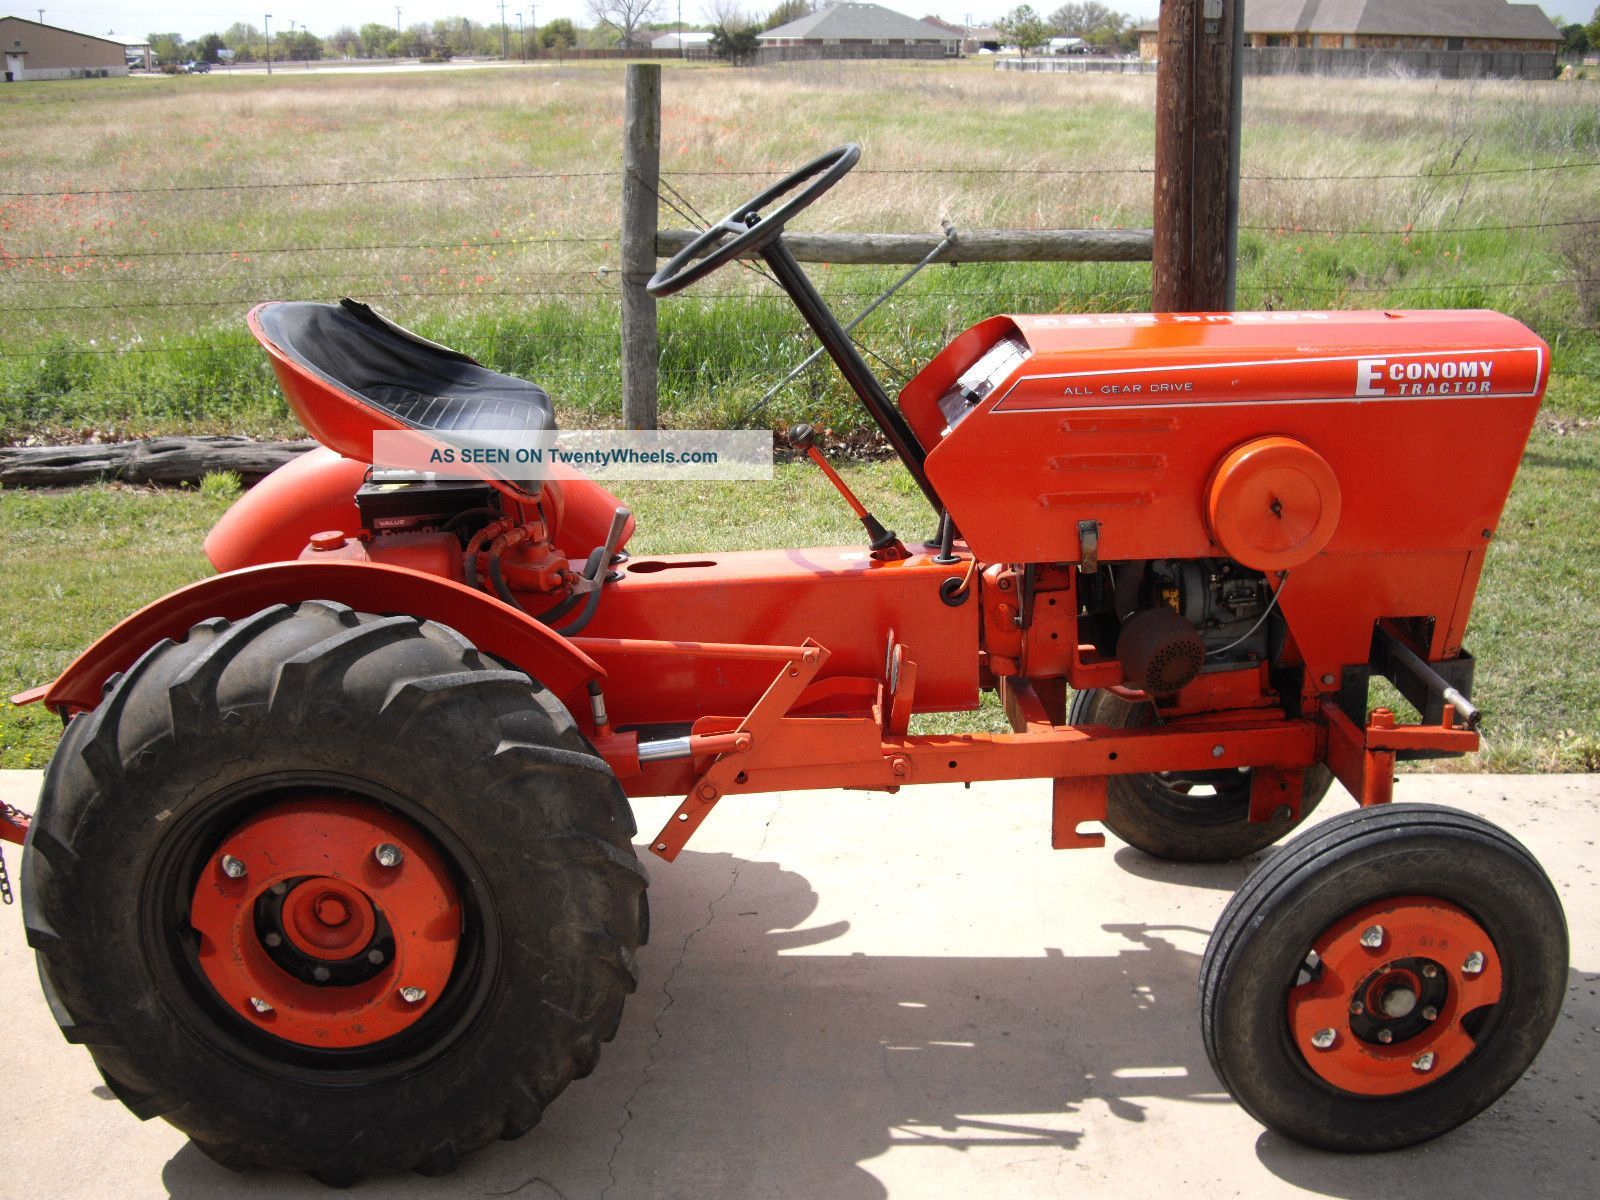 Power King Tractor 1976 Power King Tractor 14hp Kohler Engine